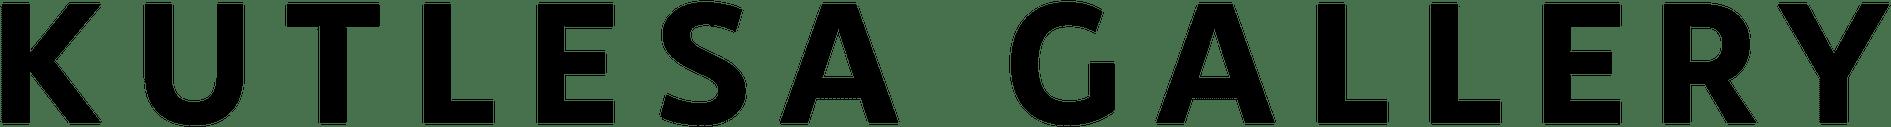 Kutlesa Gallery company logo